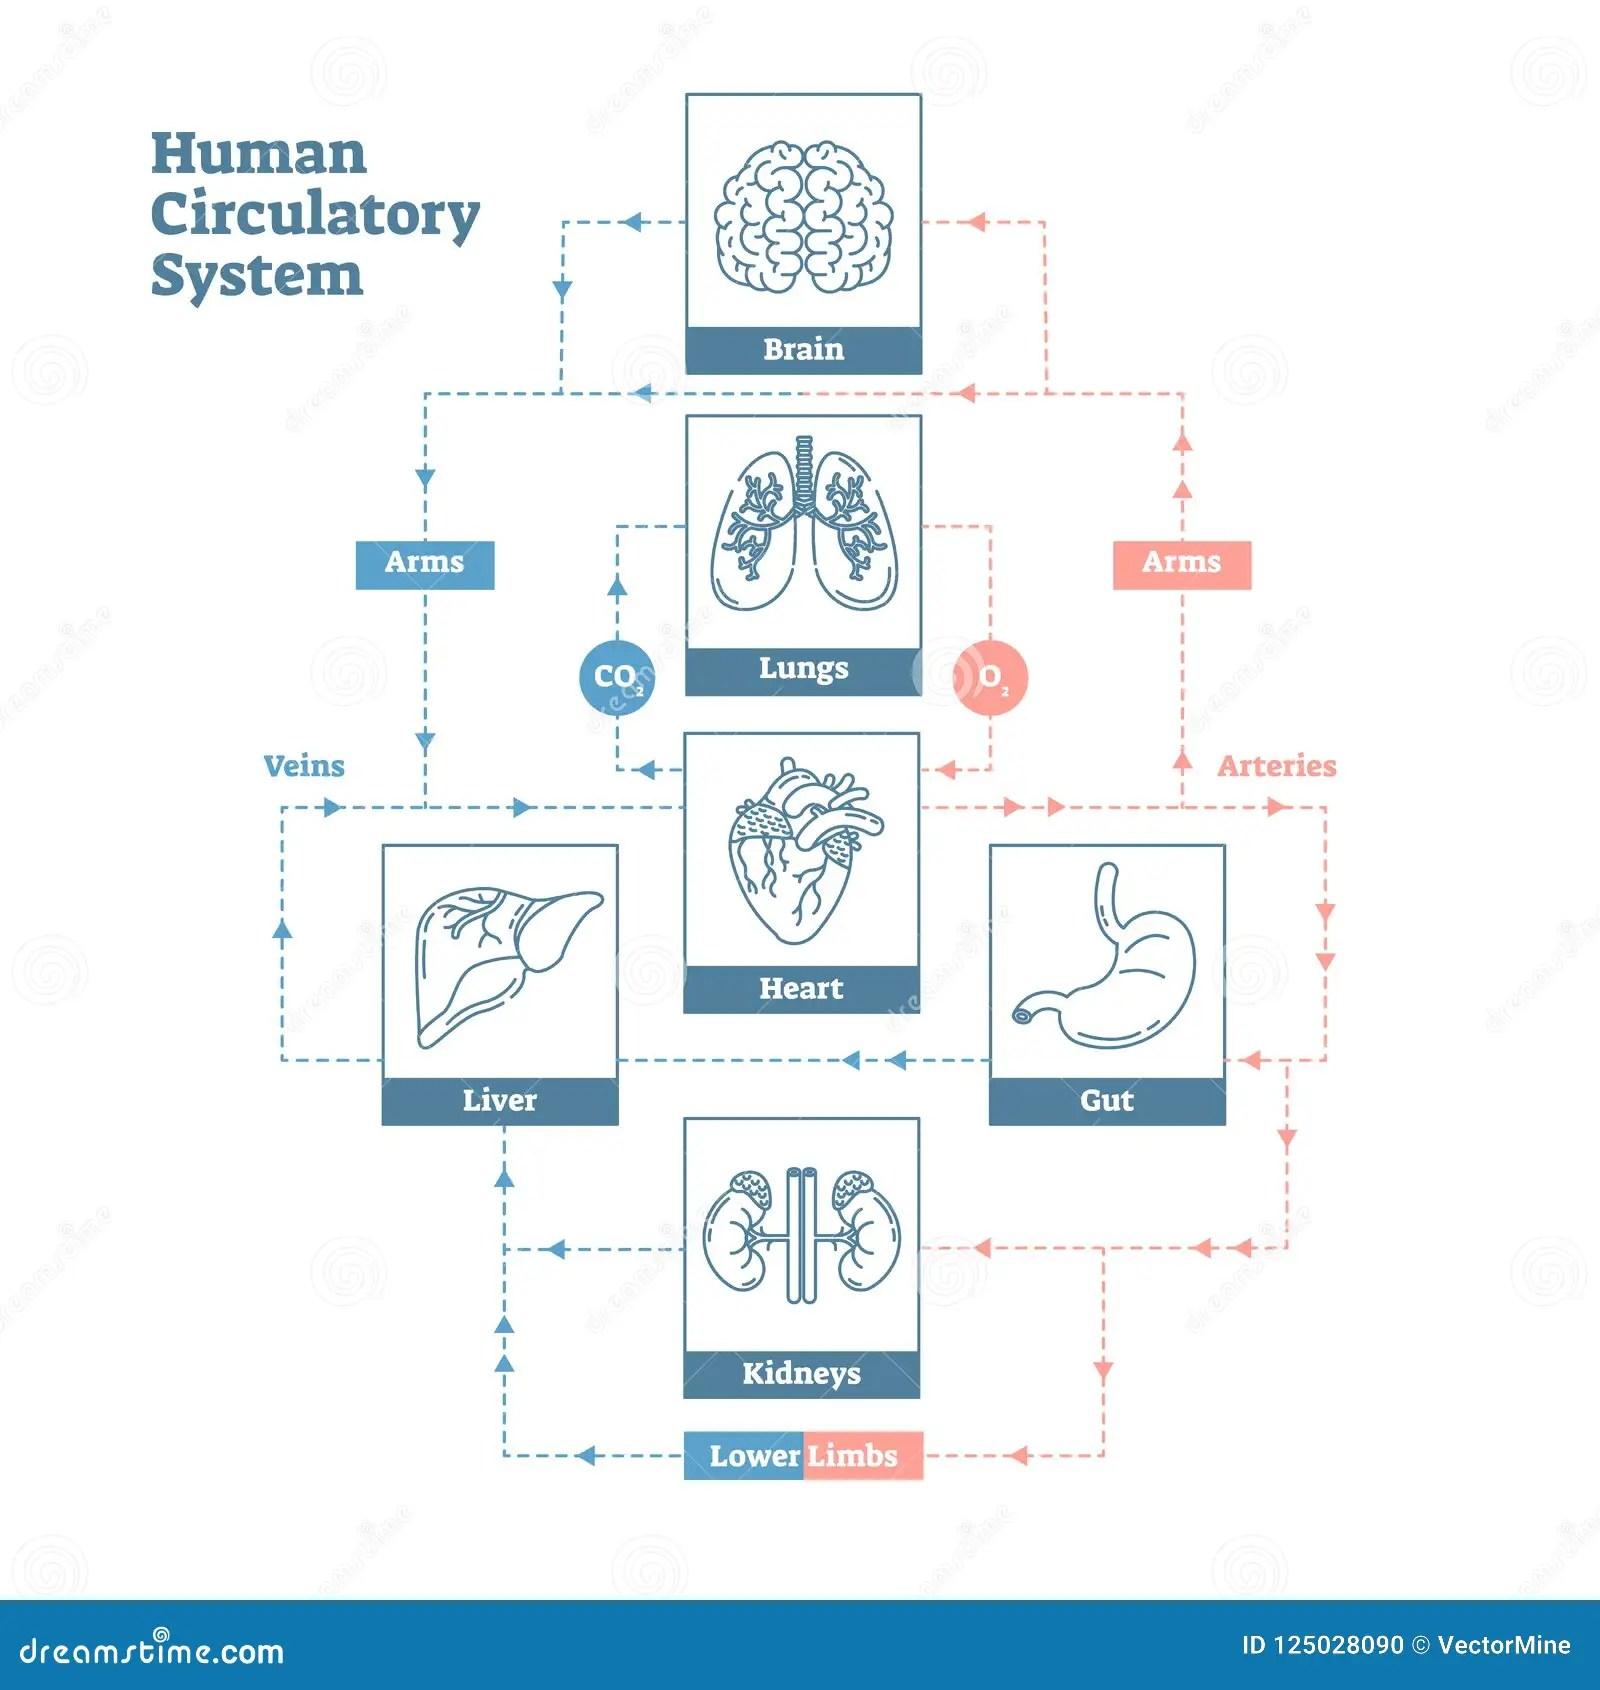 Human Circulatory System Vector Illustration Diagram